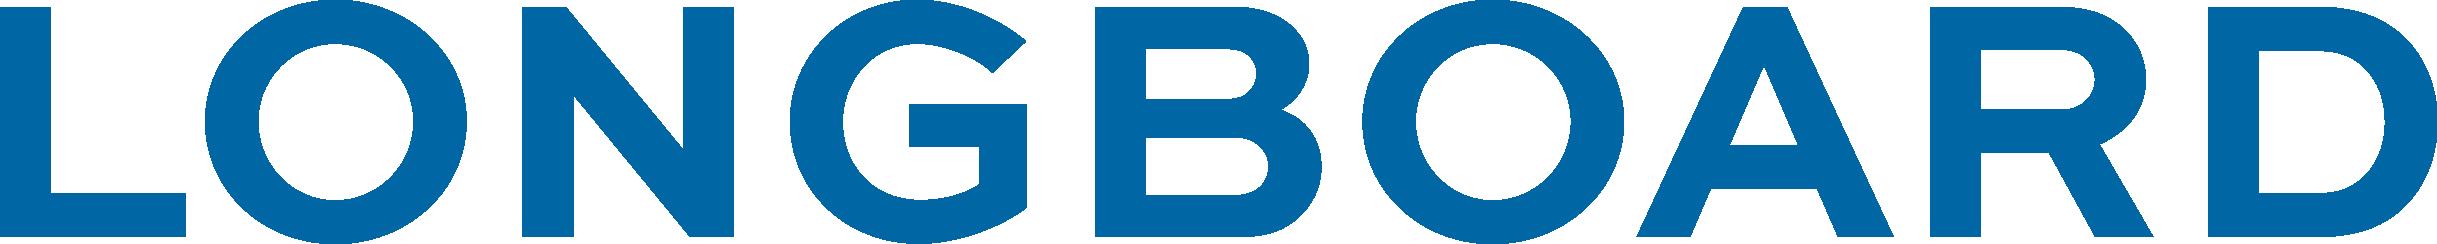 longboard rebranding - new logo